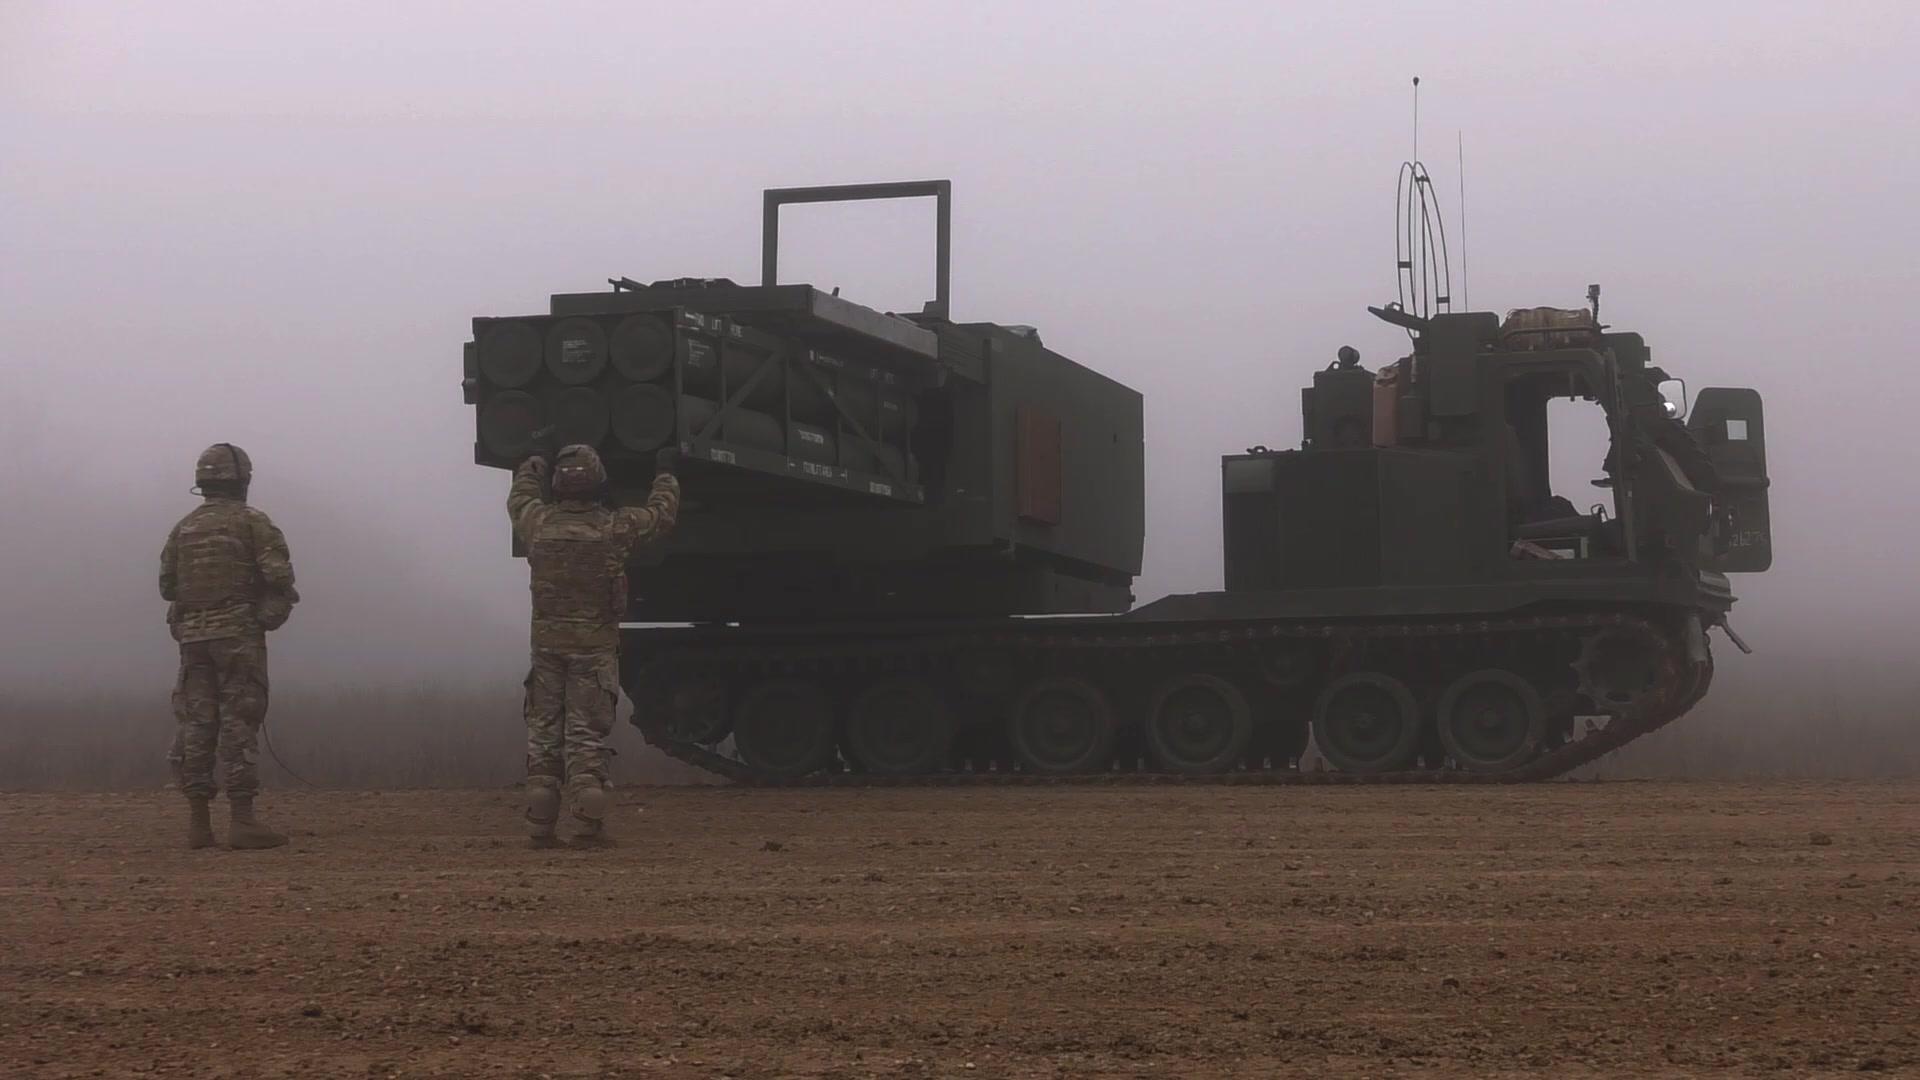 41st Field Artillery Brigade fires the M207 Multiple Launch Rocket System